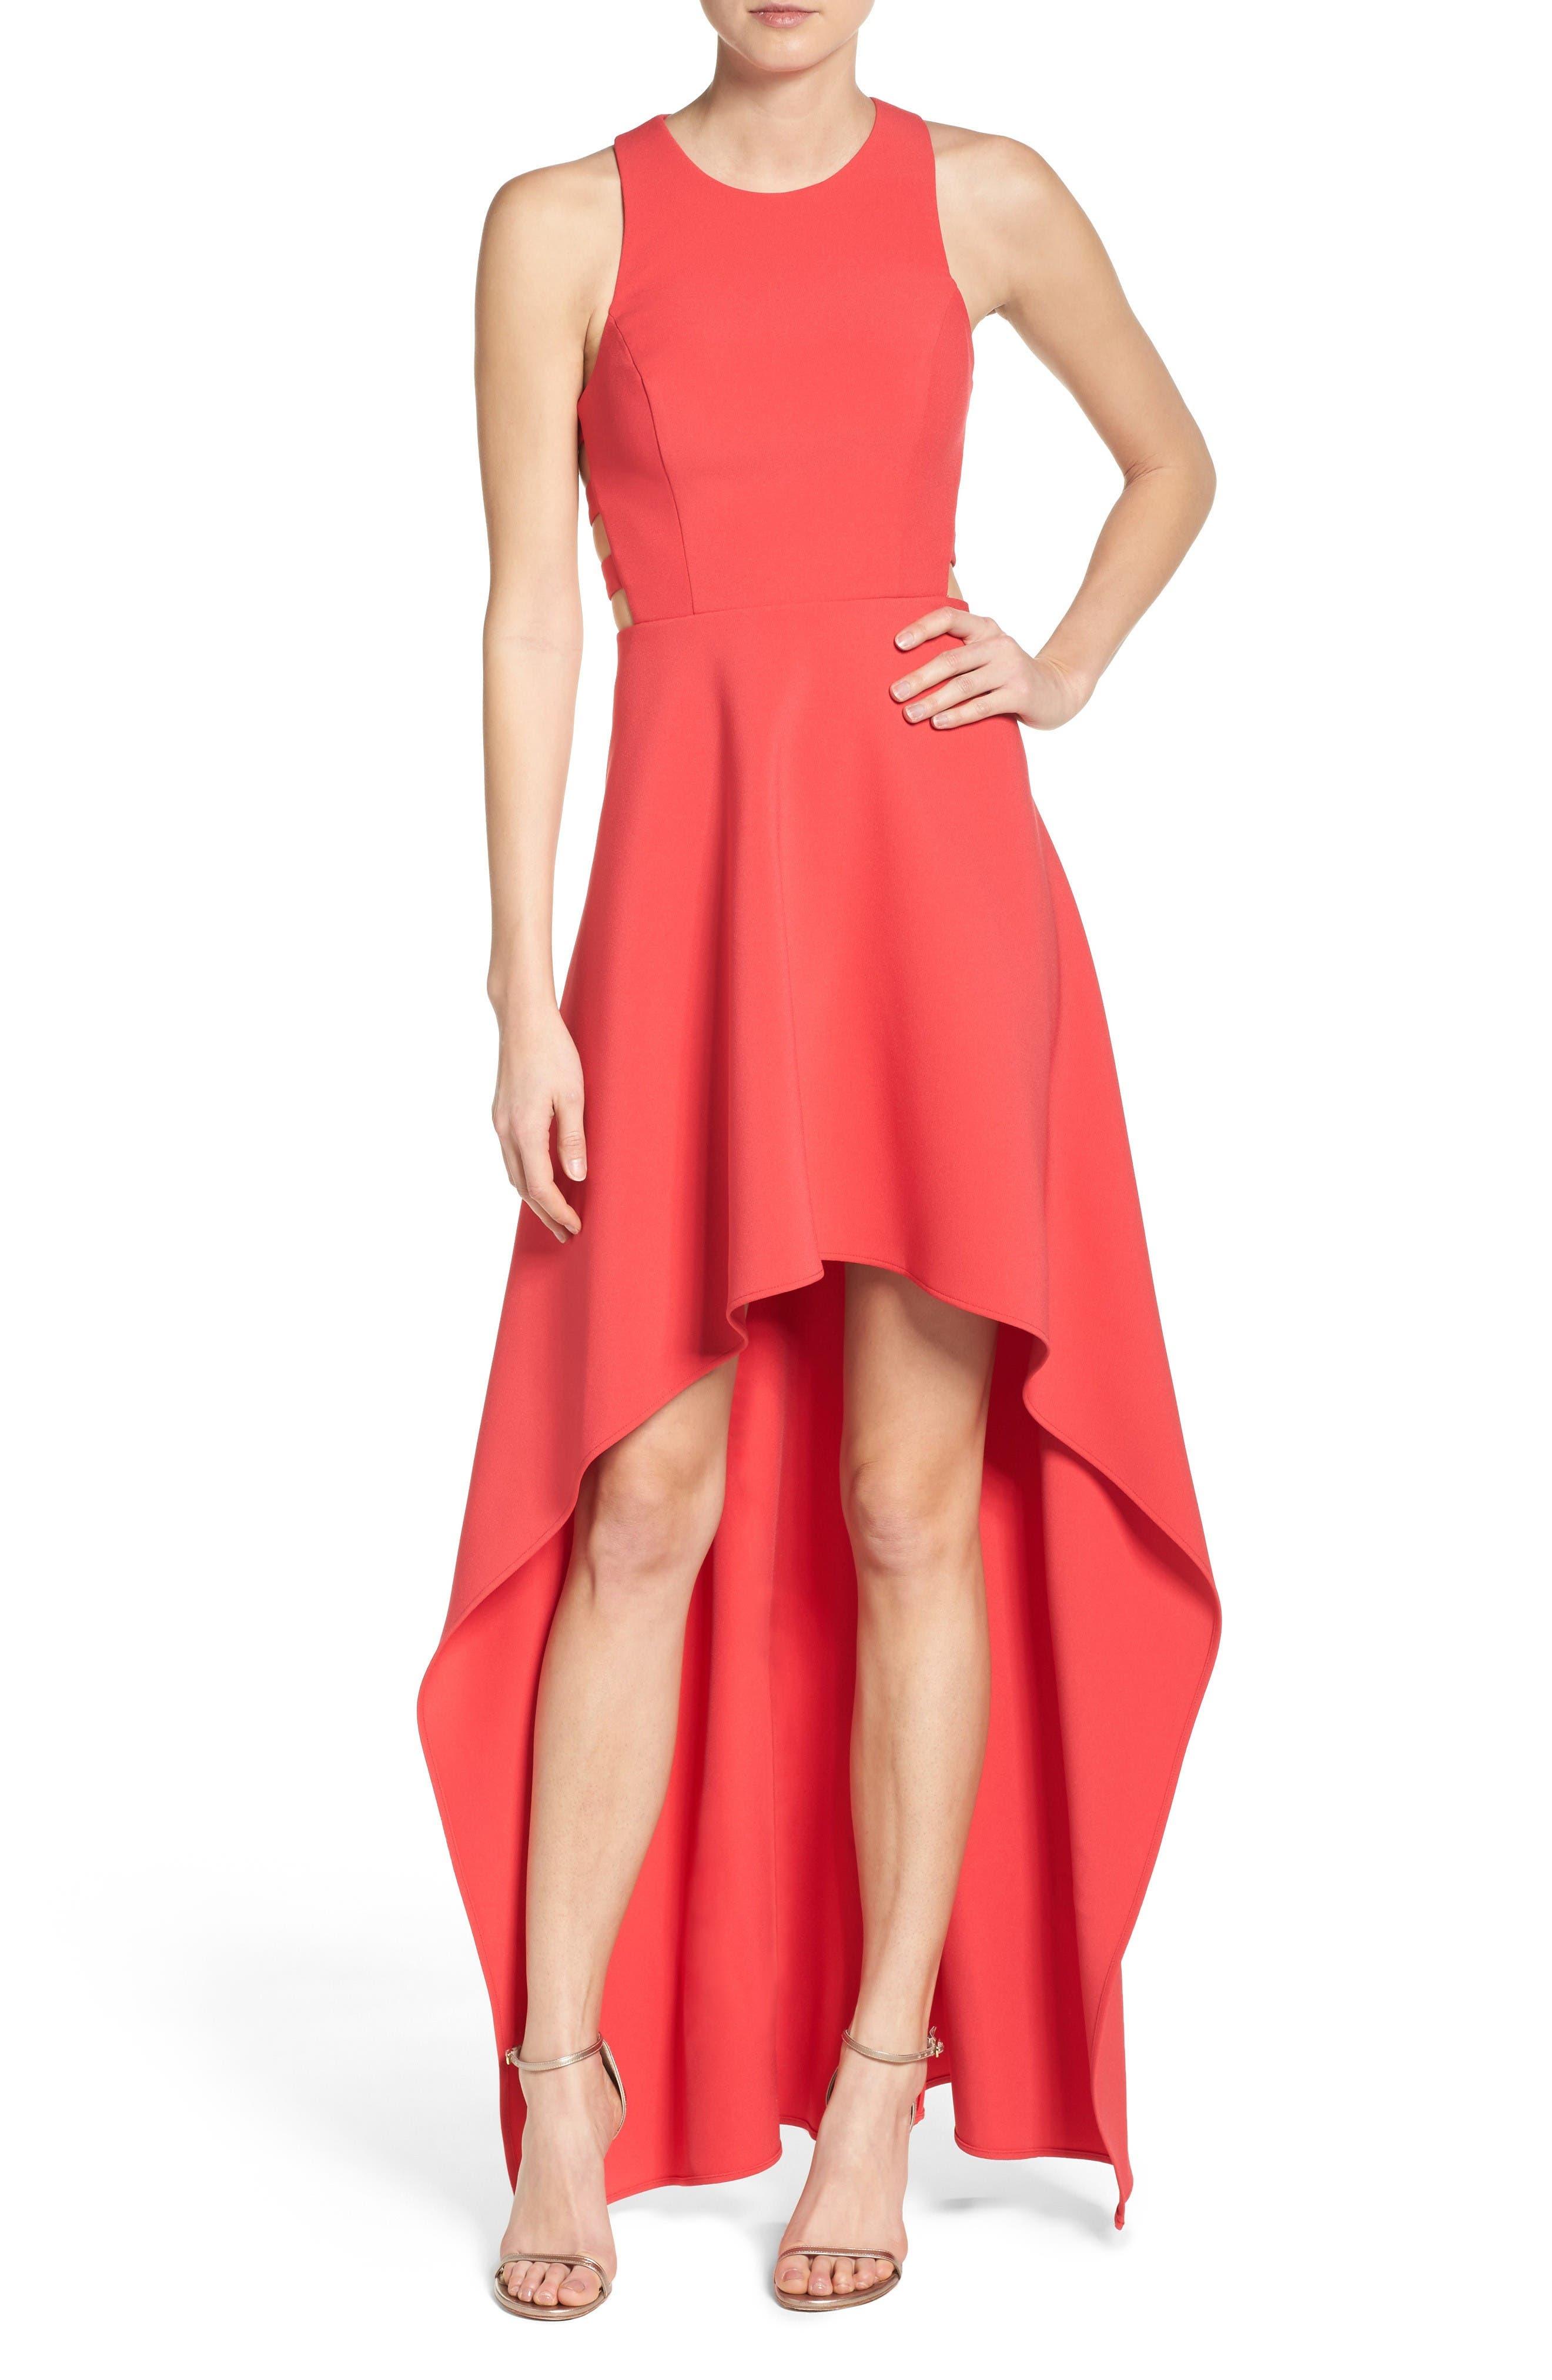 Main Image - BCBGMAXAZRIA 'Rosalyn' Cutout High/Low Crepe Gown